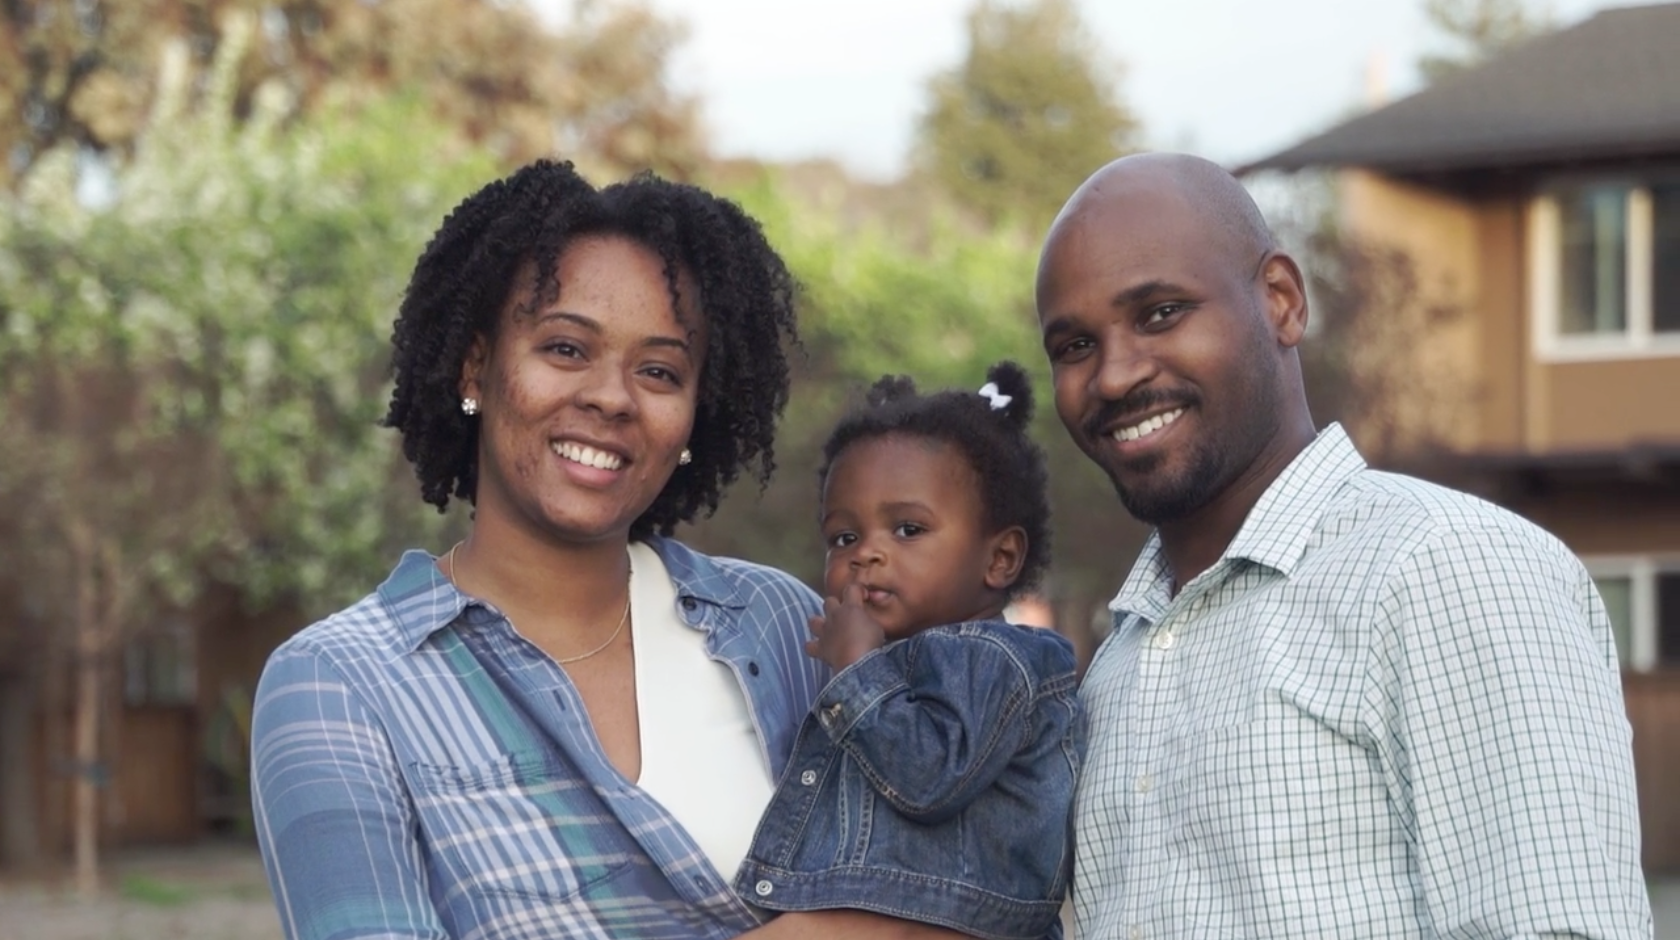 Corey Weathers family portrait